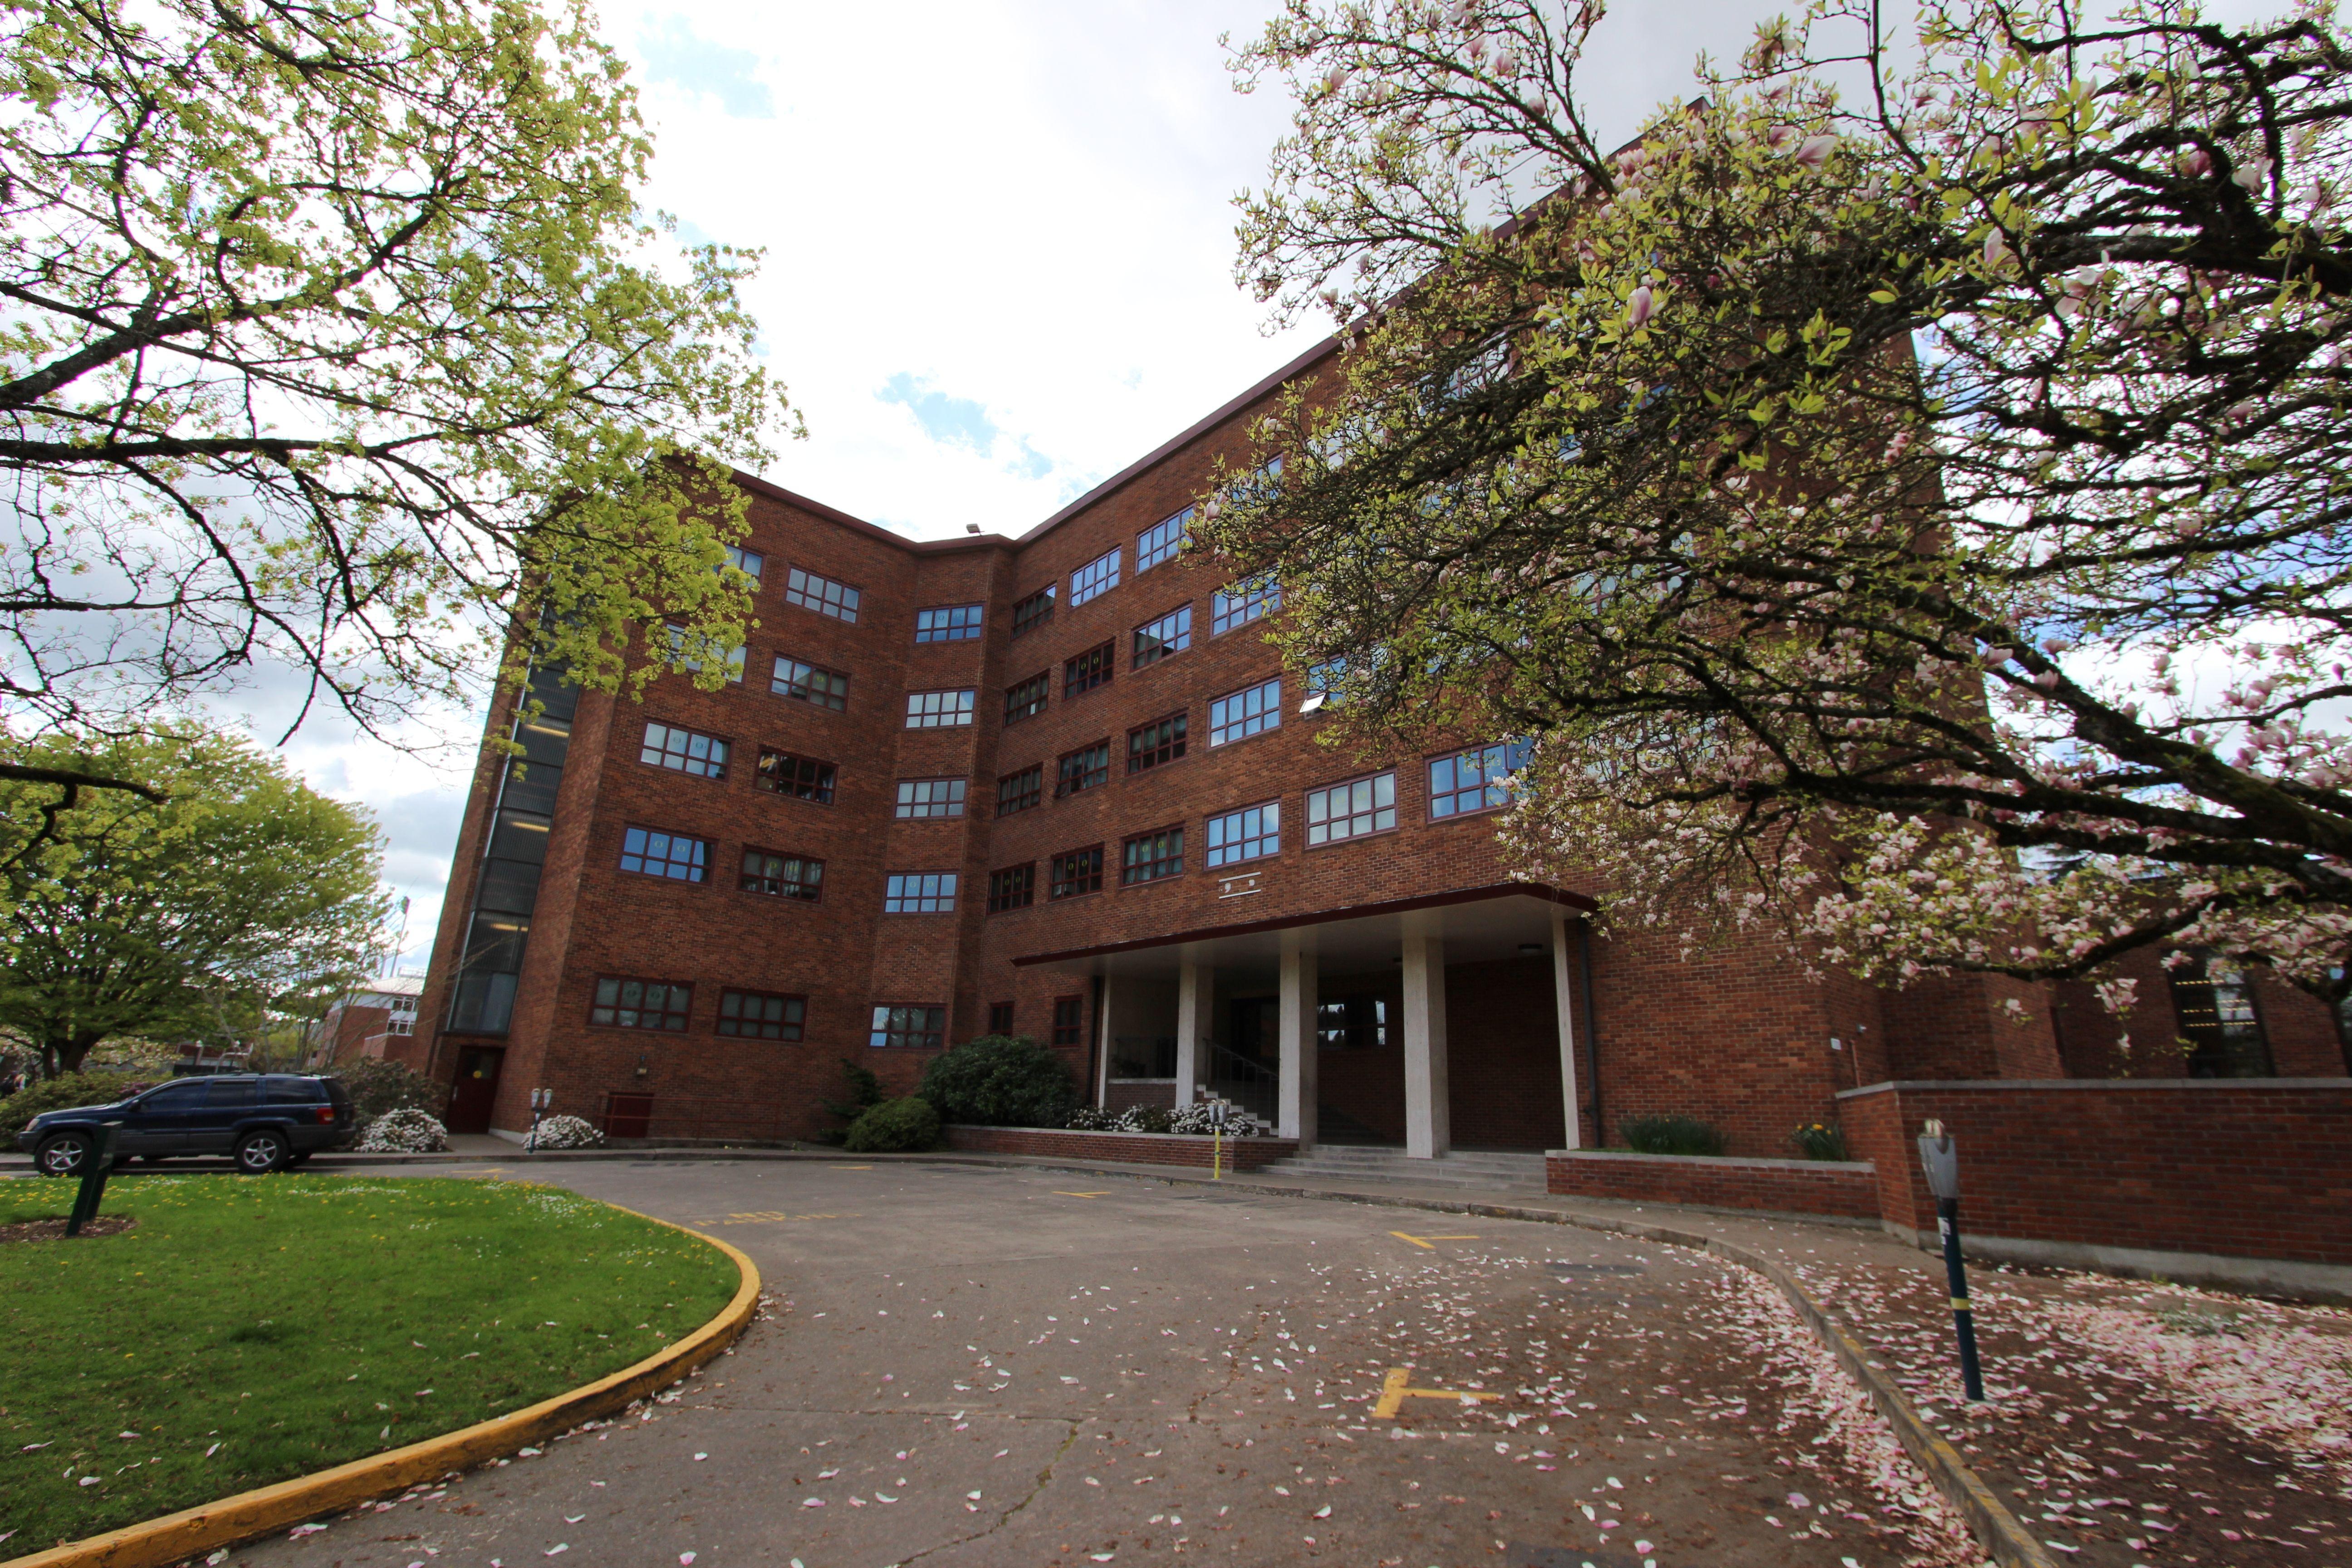 75d6b99d85d18dd43df00e563a631ead - University Of Oregon Housing Application Deadline